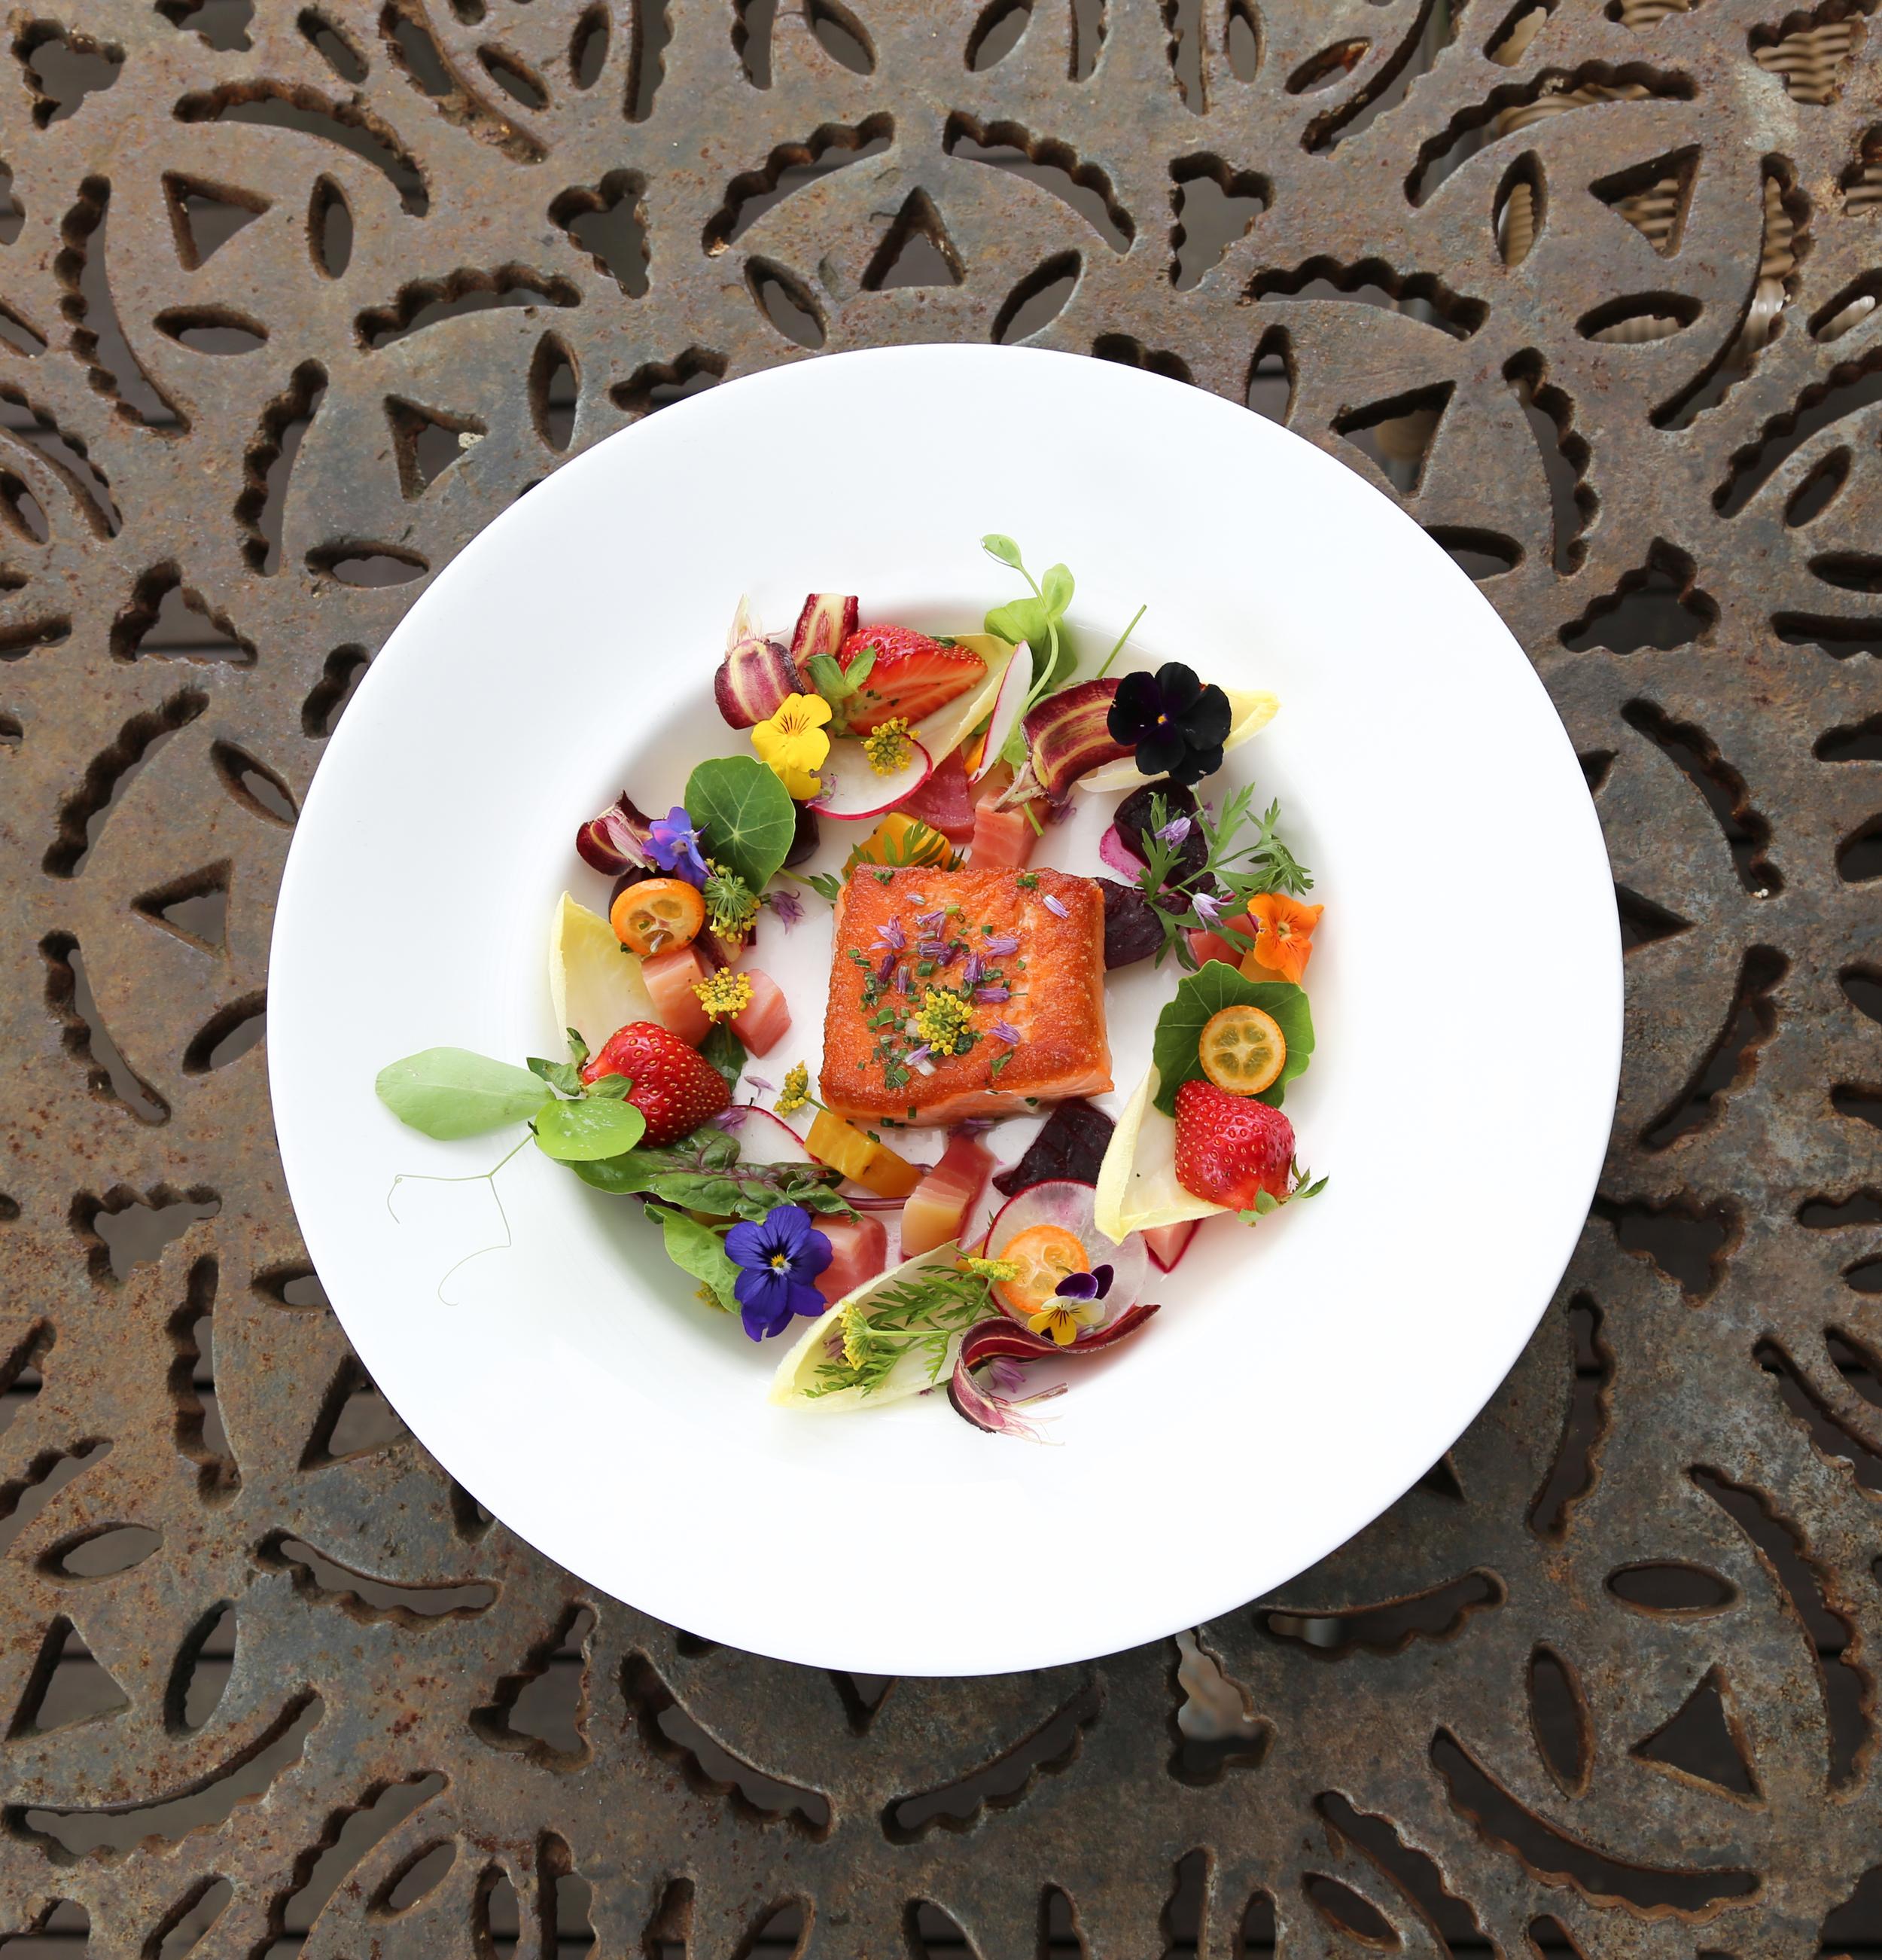 wild salmon, herbs and flowers - Barndiva